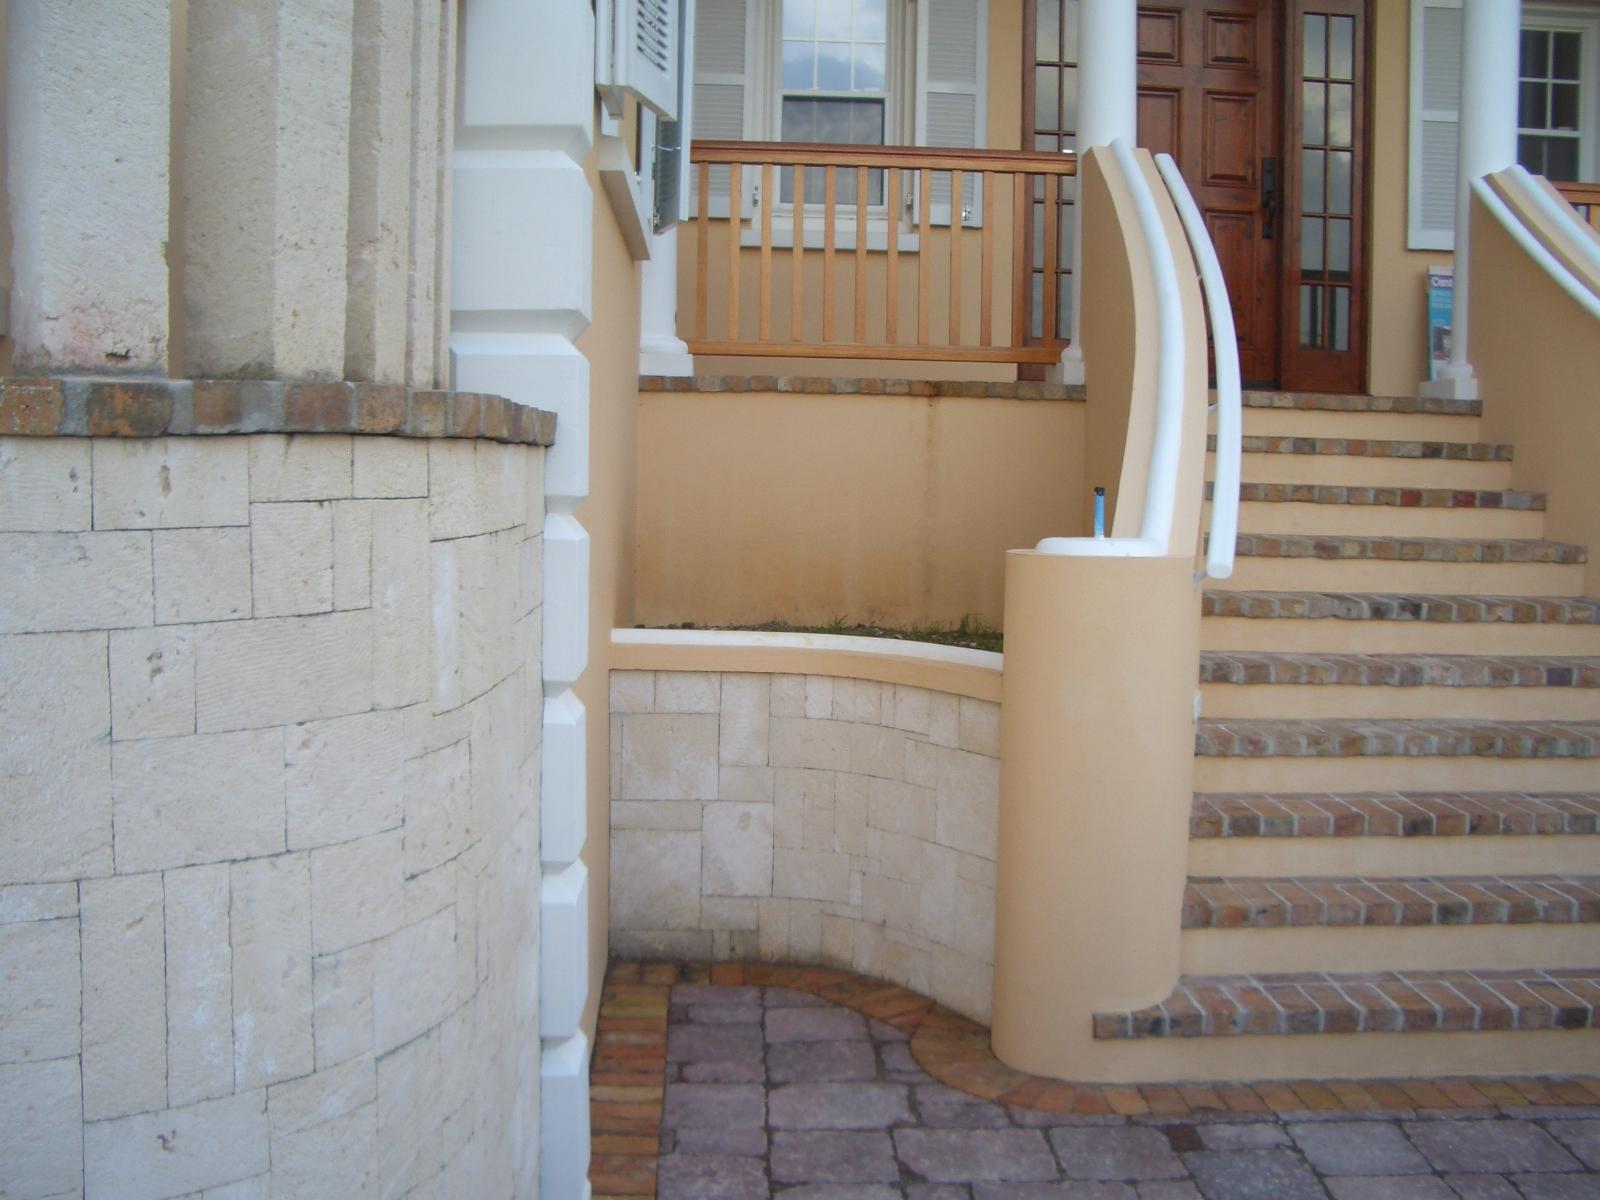 Pvc Doors And Windows Bermuda : Pitchers bermuda landscaping